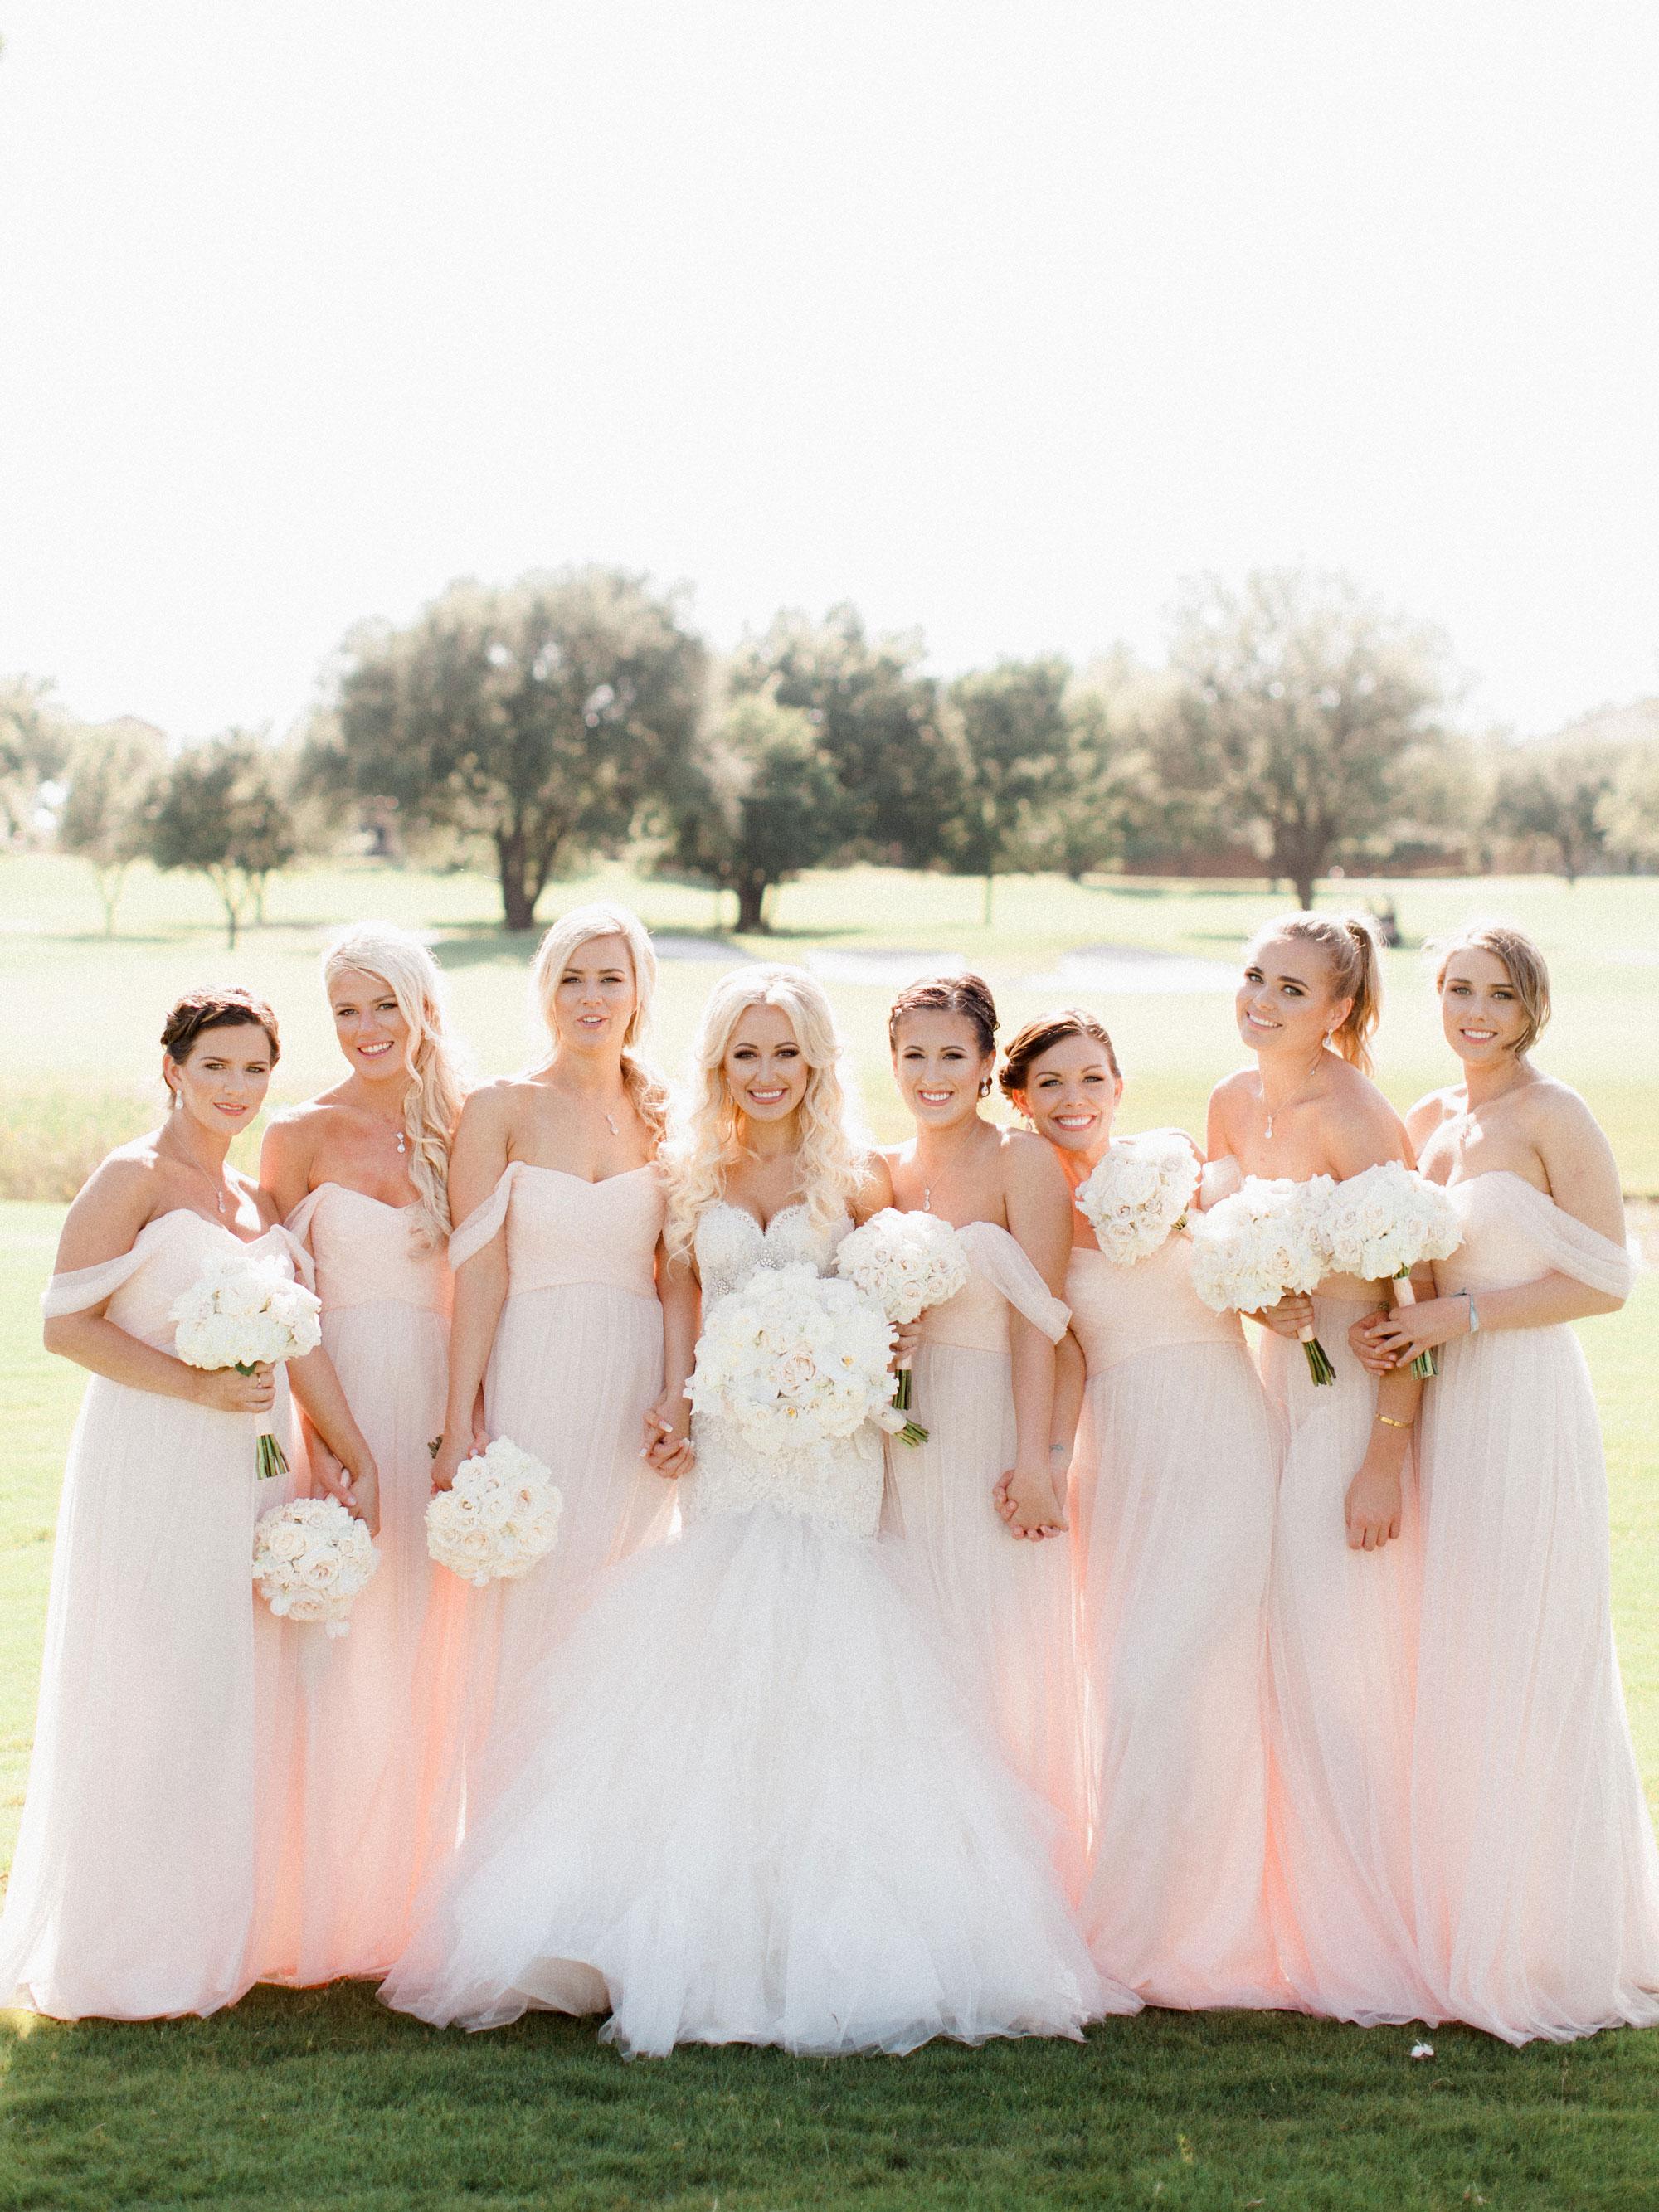 Inside Weddings Spring 2017 issue bride in mermaid dress bridesmaids in blush off the shoulder bridesmaid dresses